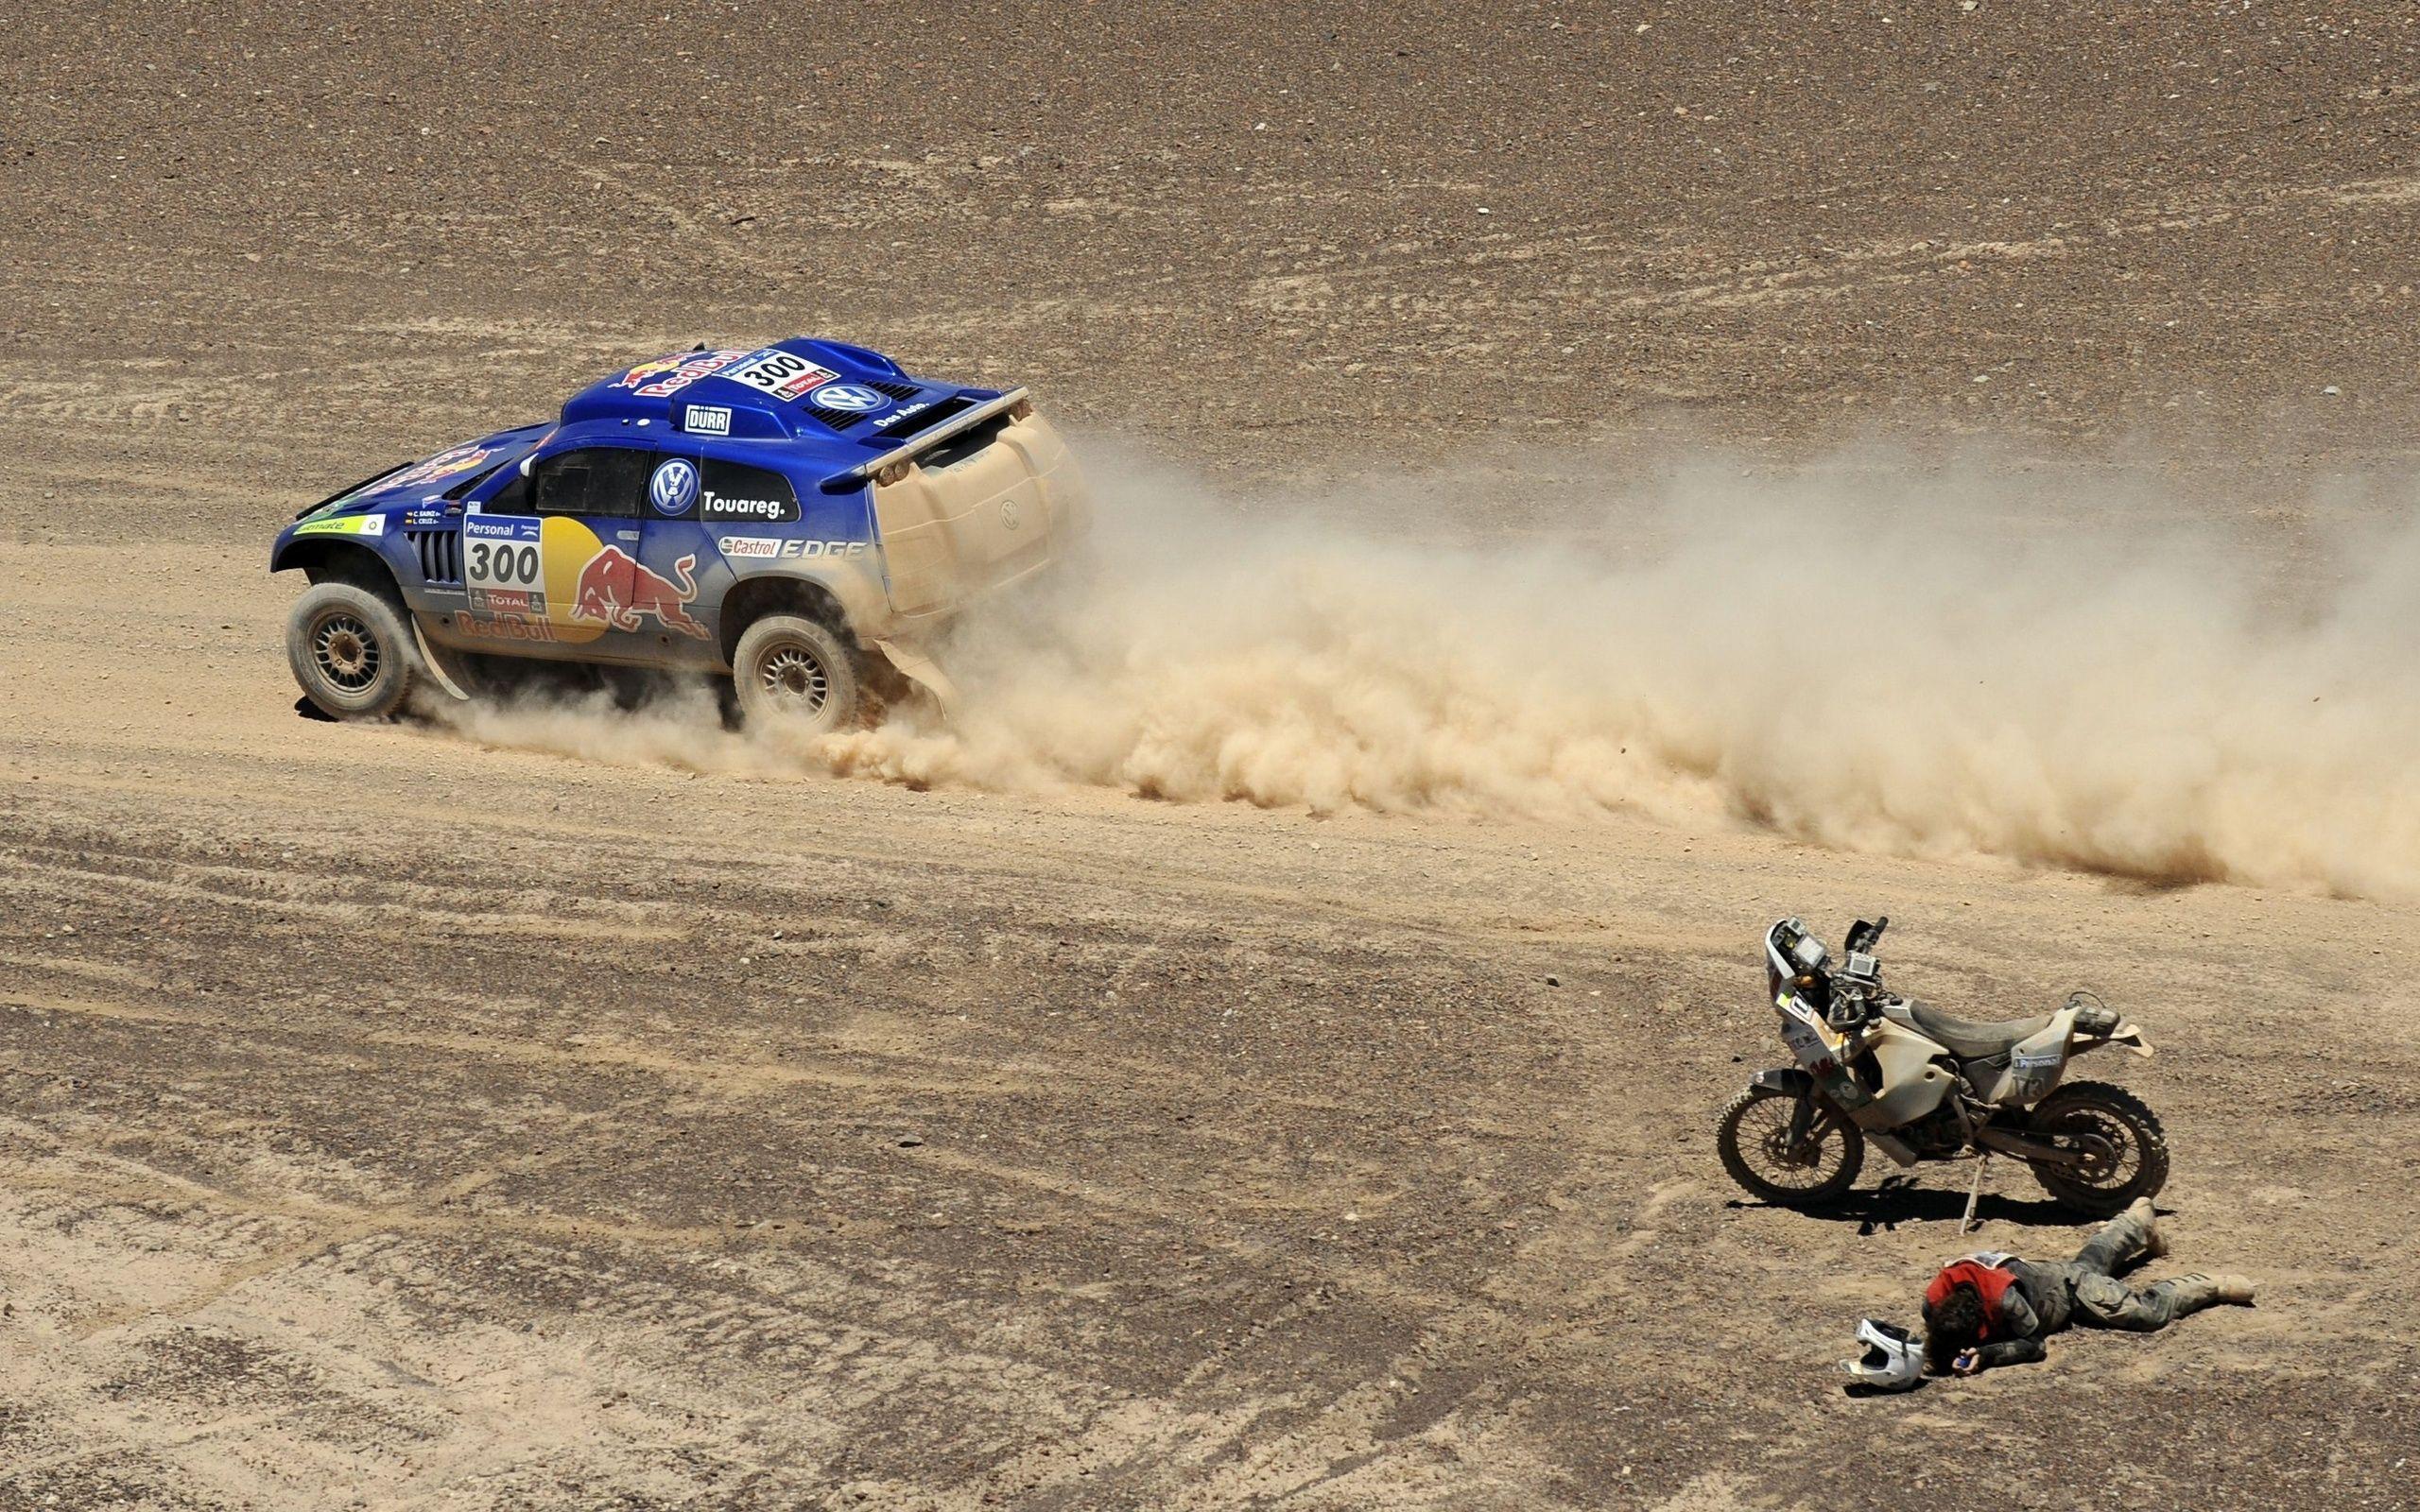 2560x1600 Race, Dakar, Volkswagen, Sports, Motorcycle, Dakar, The ...